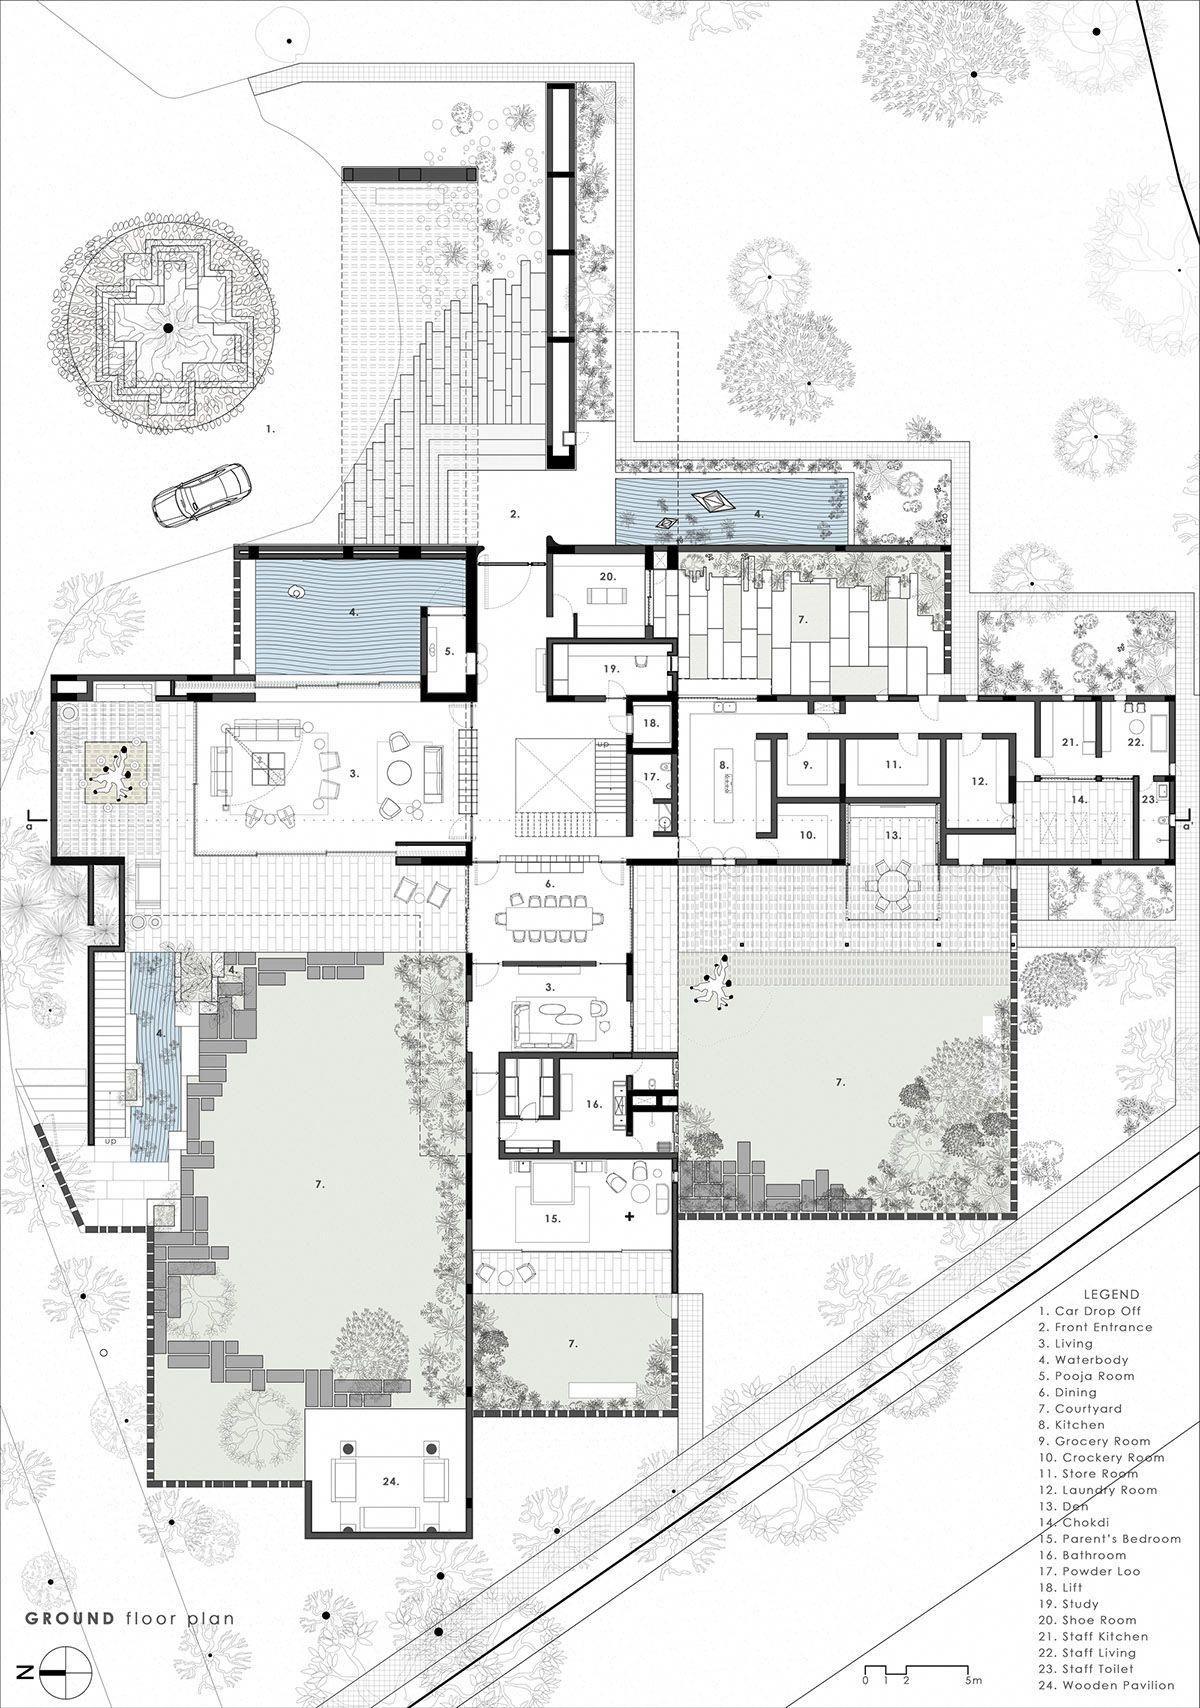 Modern Home Design App Modernhomedesign Architectural Floor Plans Drawing House Plans Home Design Floor Plans